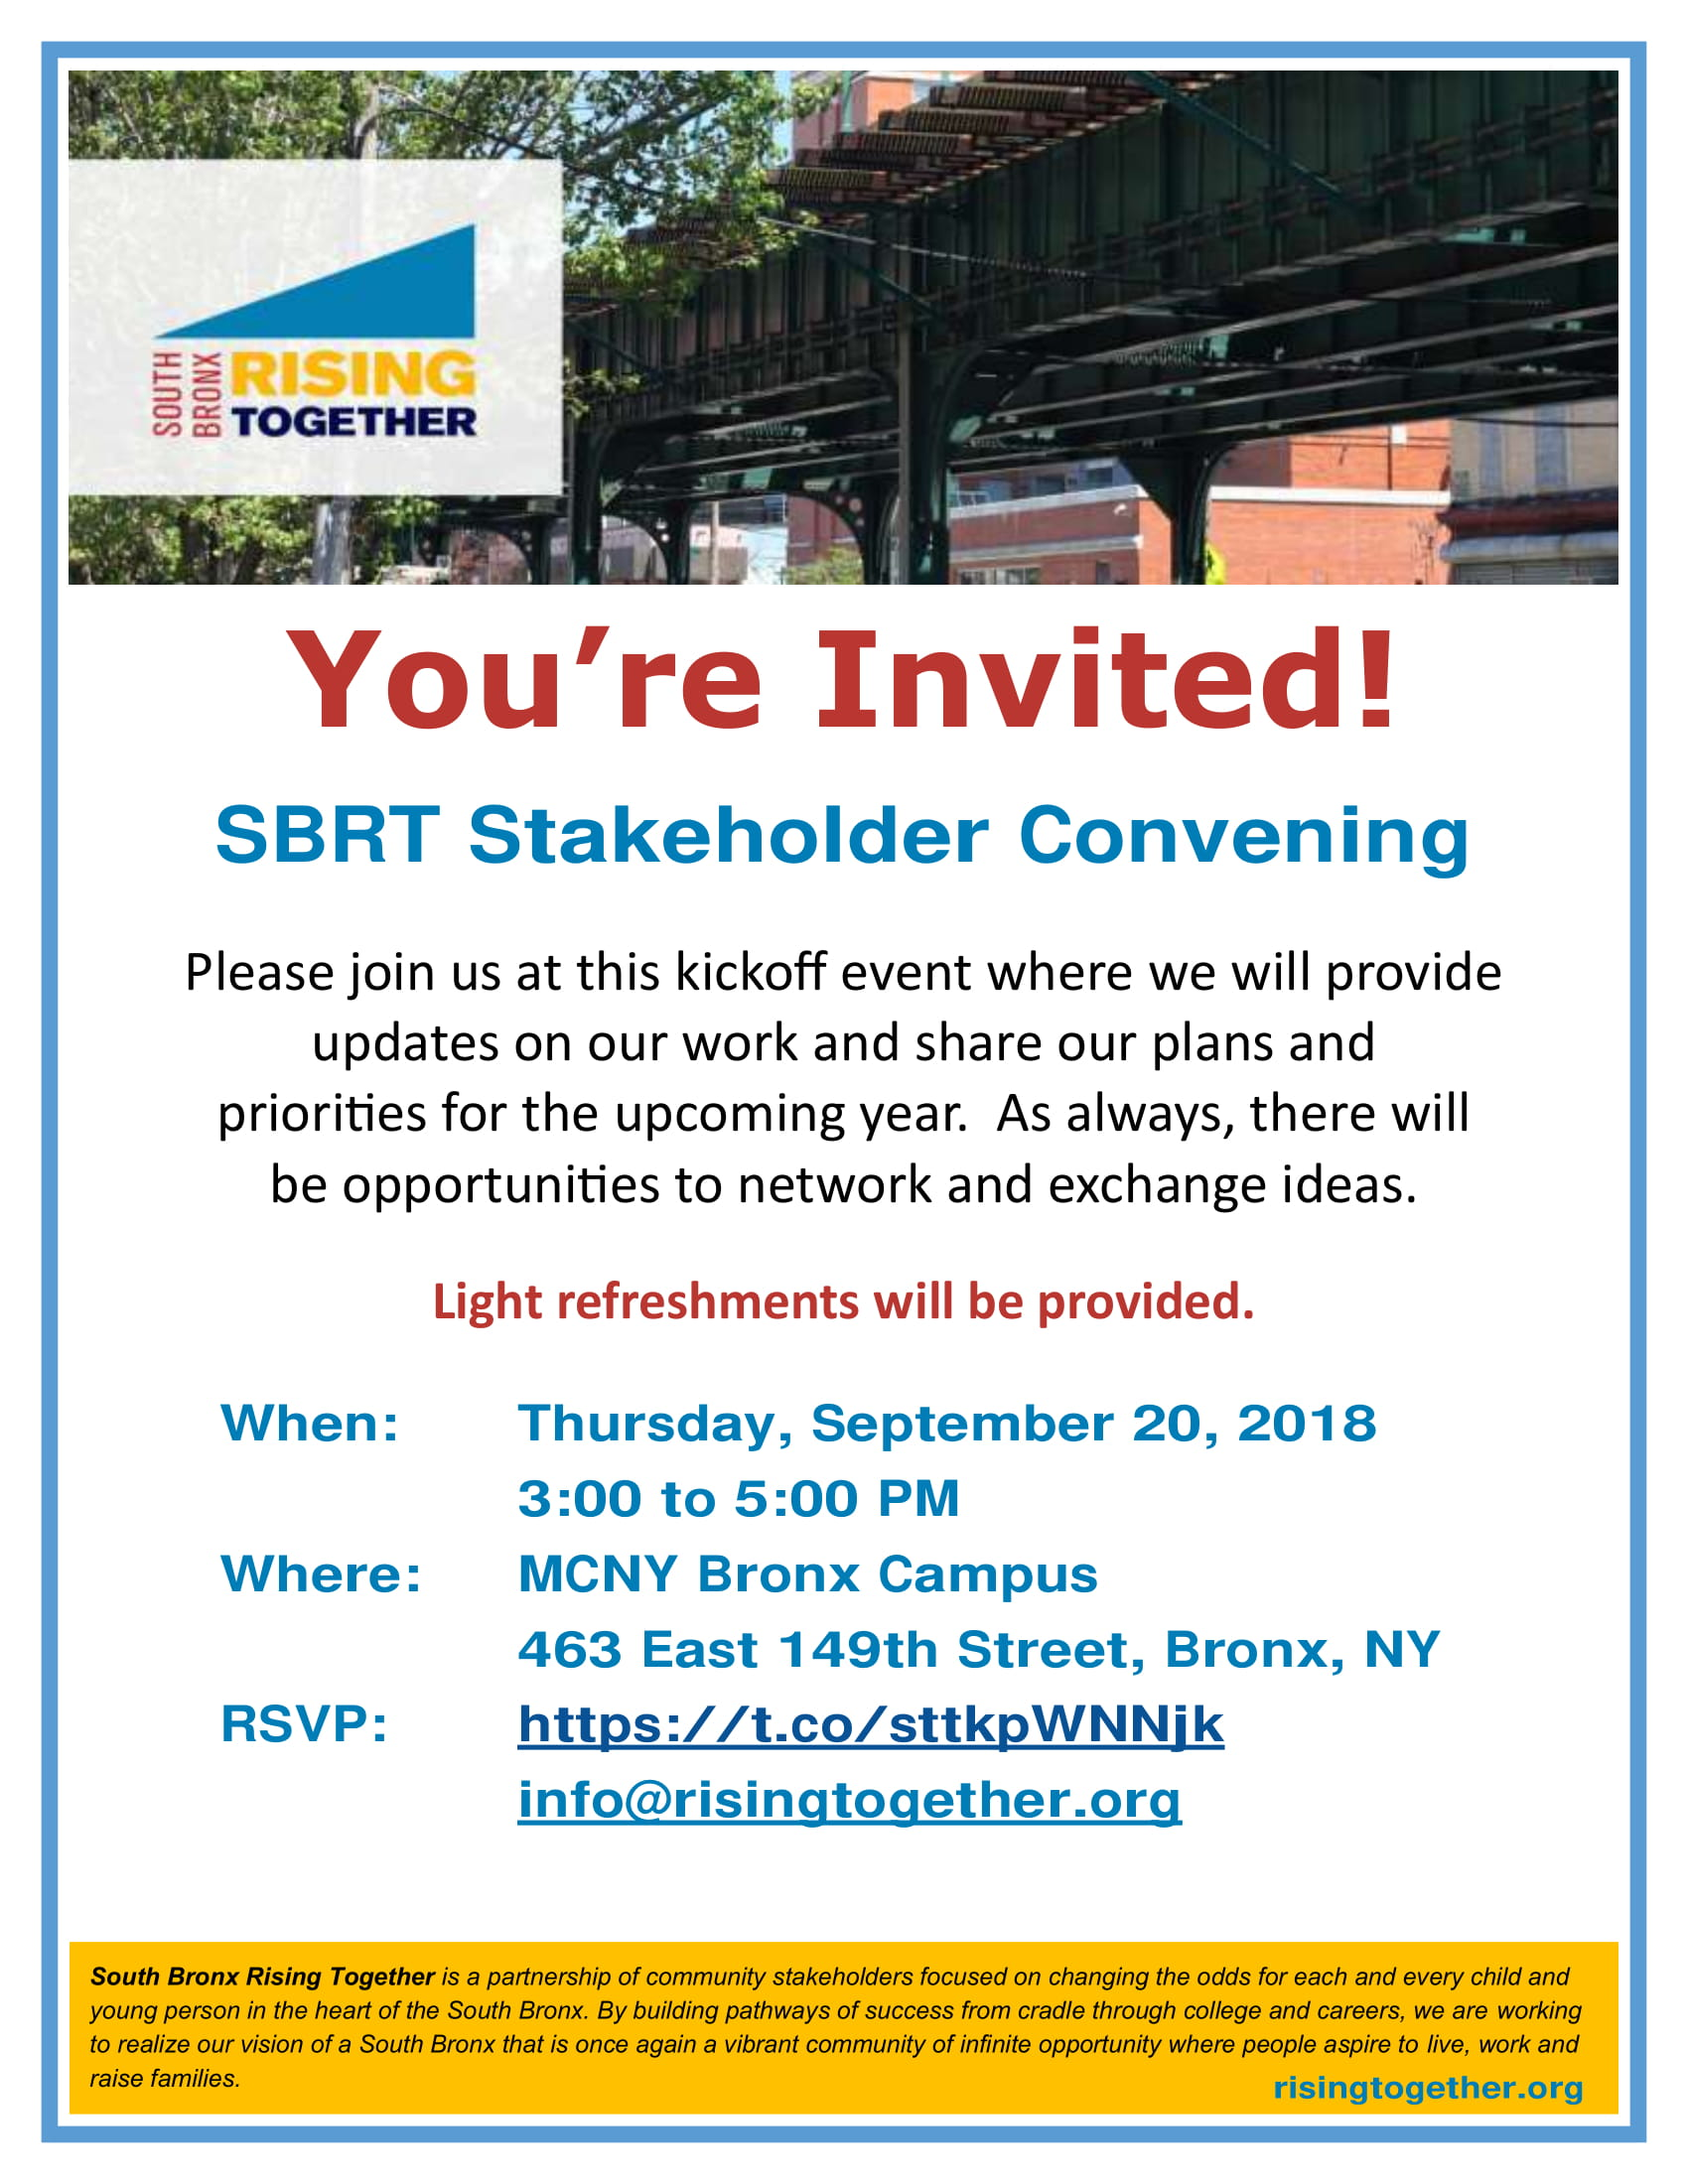 SBRT Stakeholder Convening 180920 (002)-1.jpg